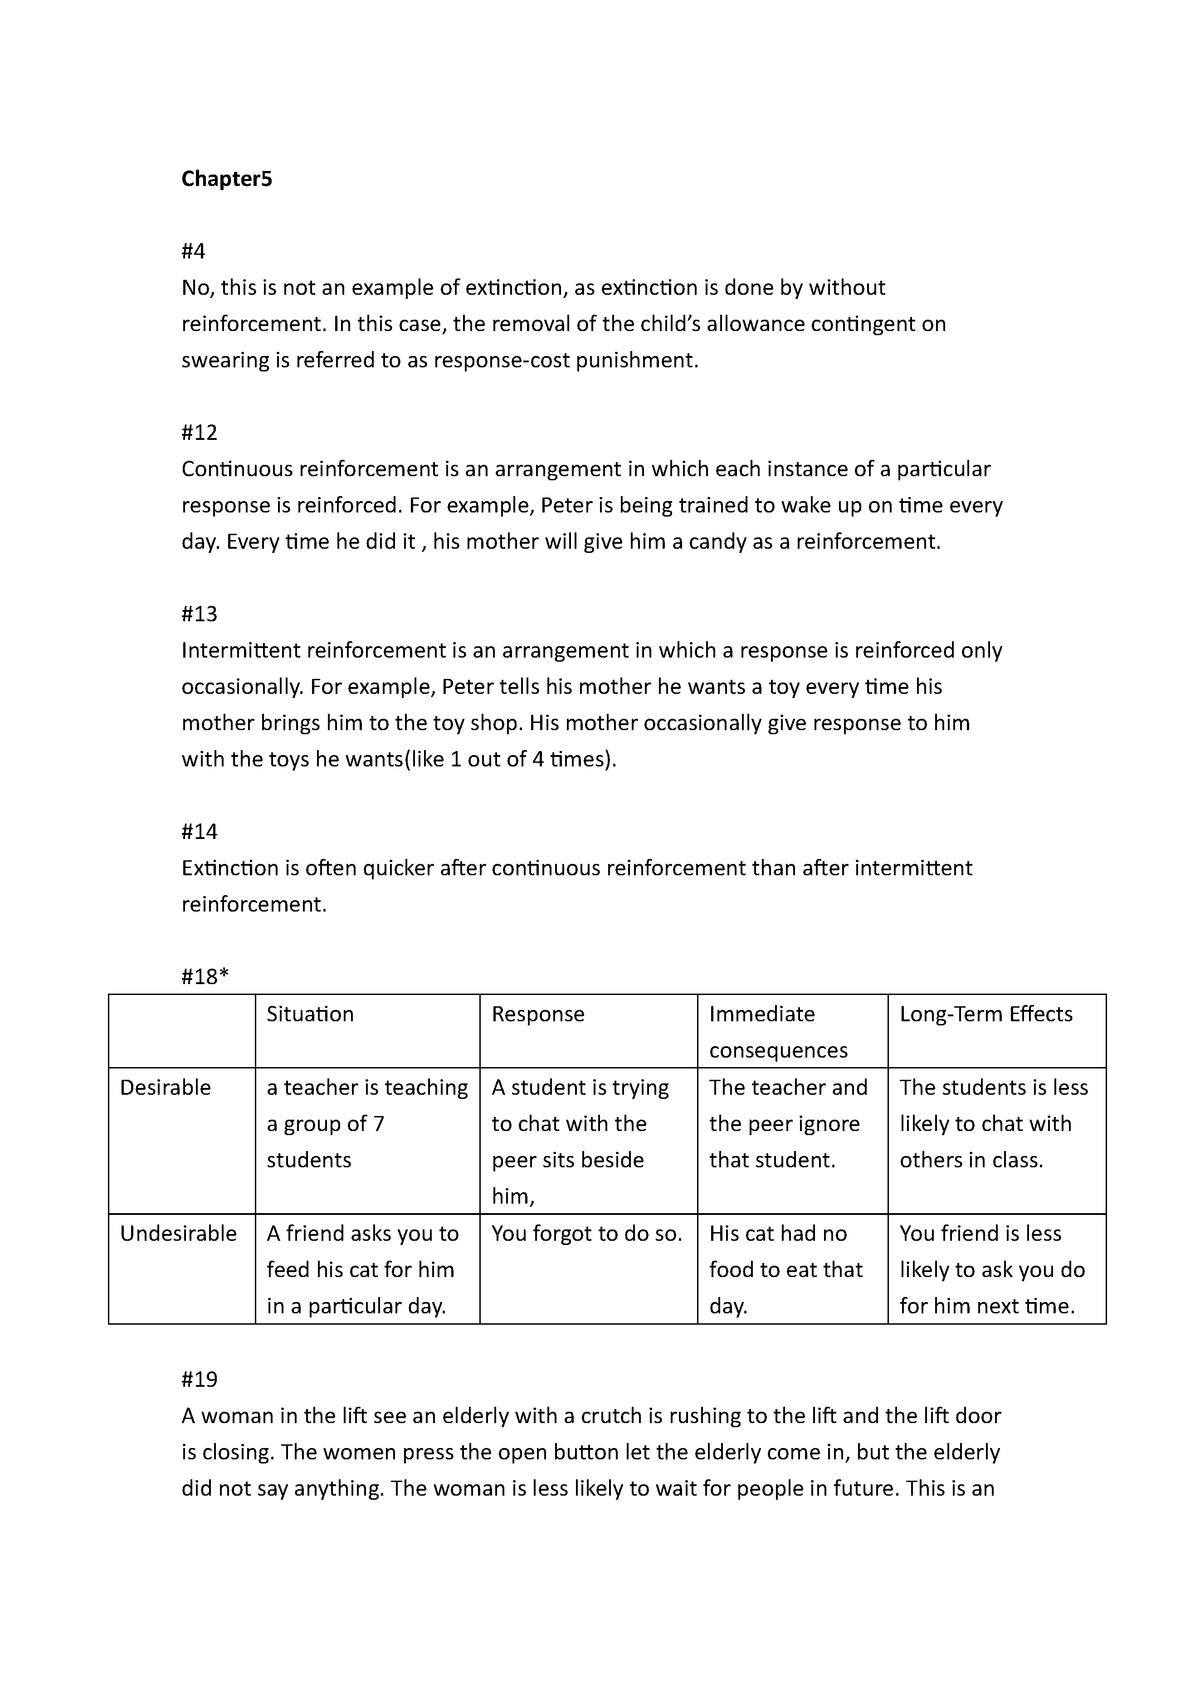 PSYC2440 Assignment 2 - PSYC 2440: Behaviour Modification